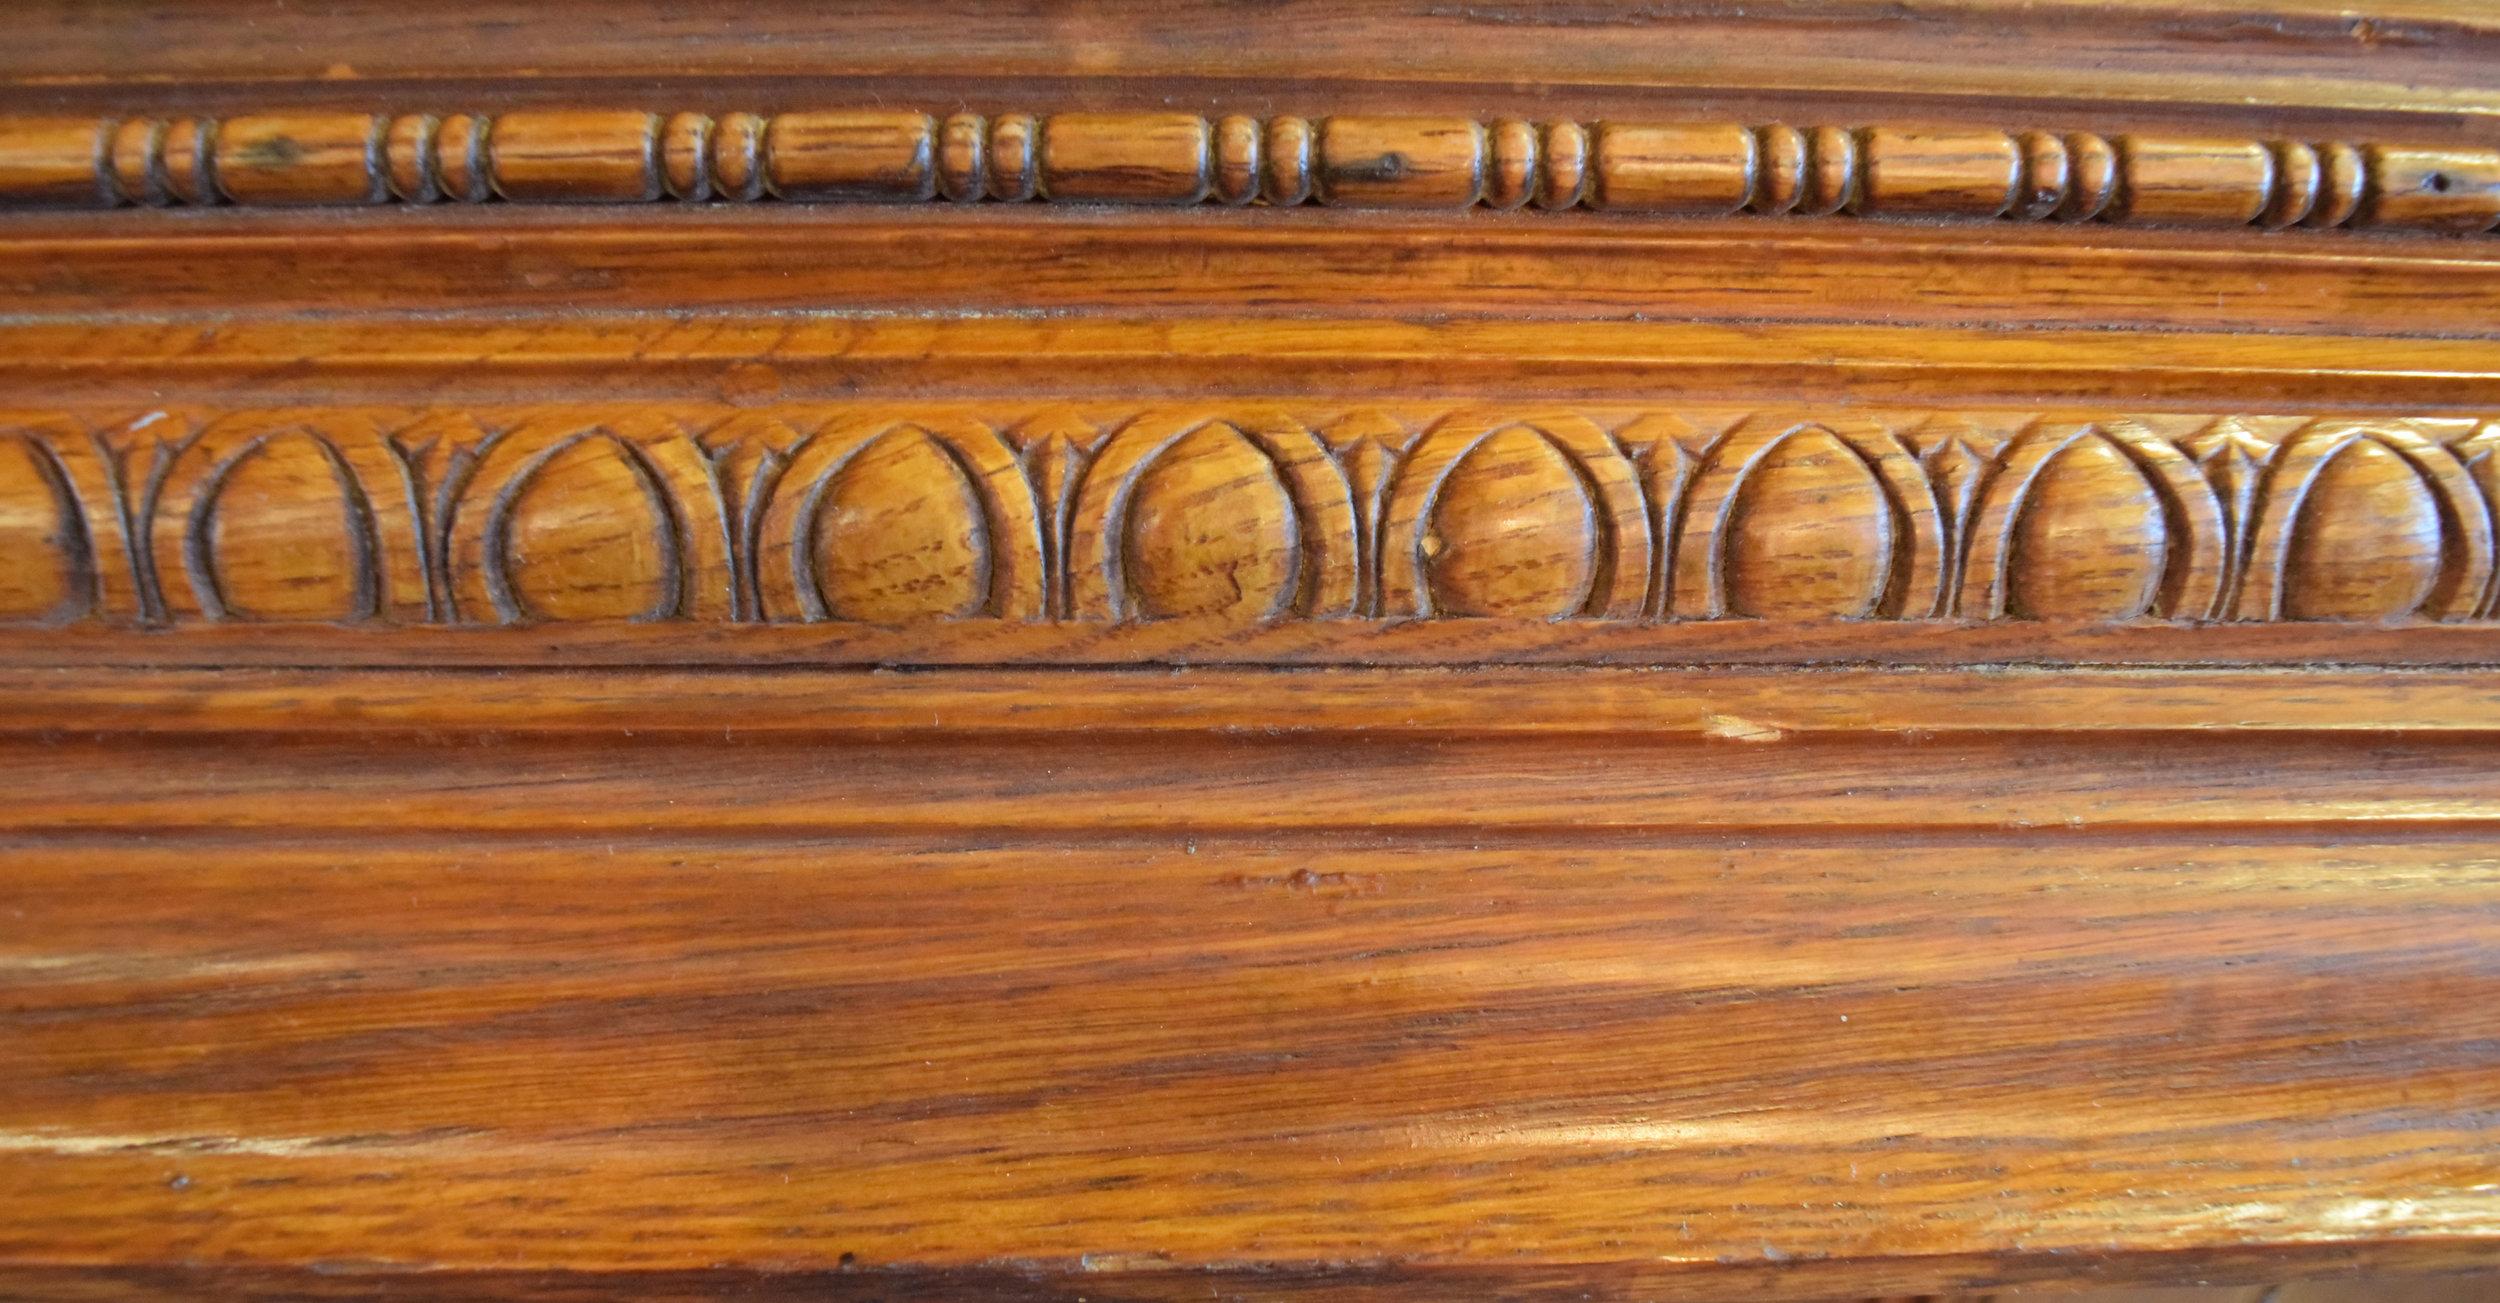 47048-quarter-sawn-oak-header-detail-2.jpg